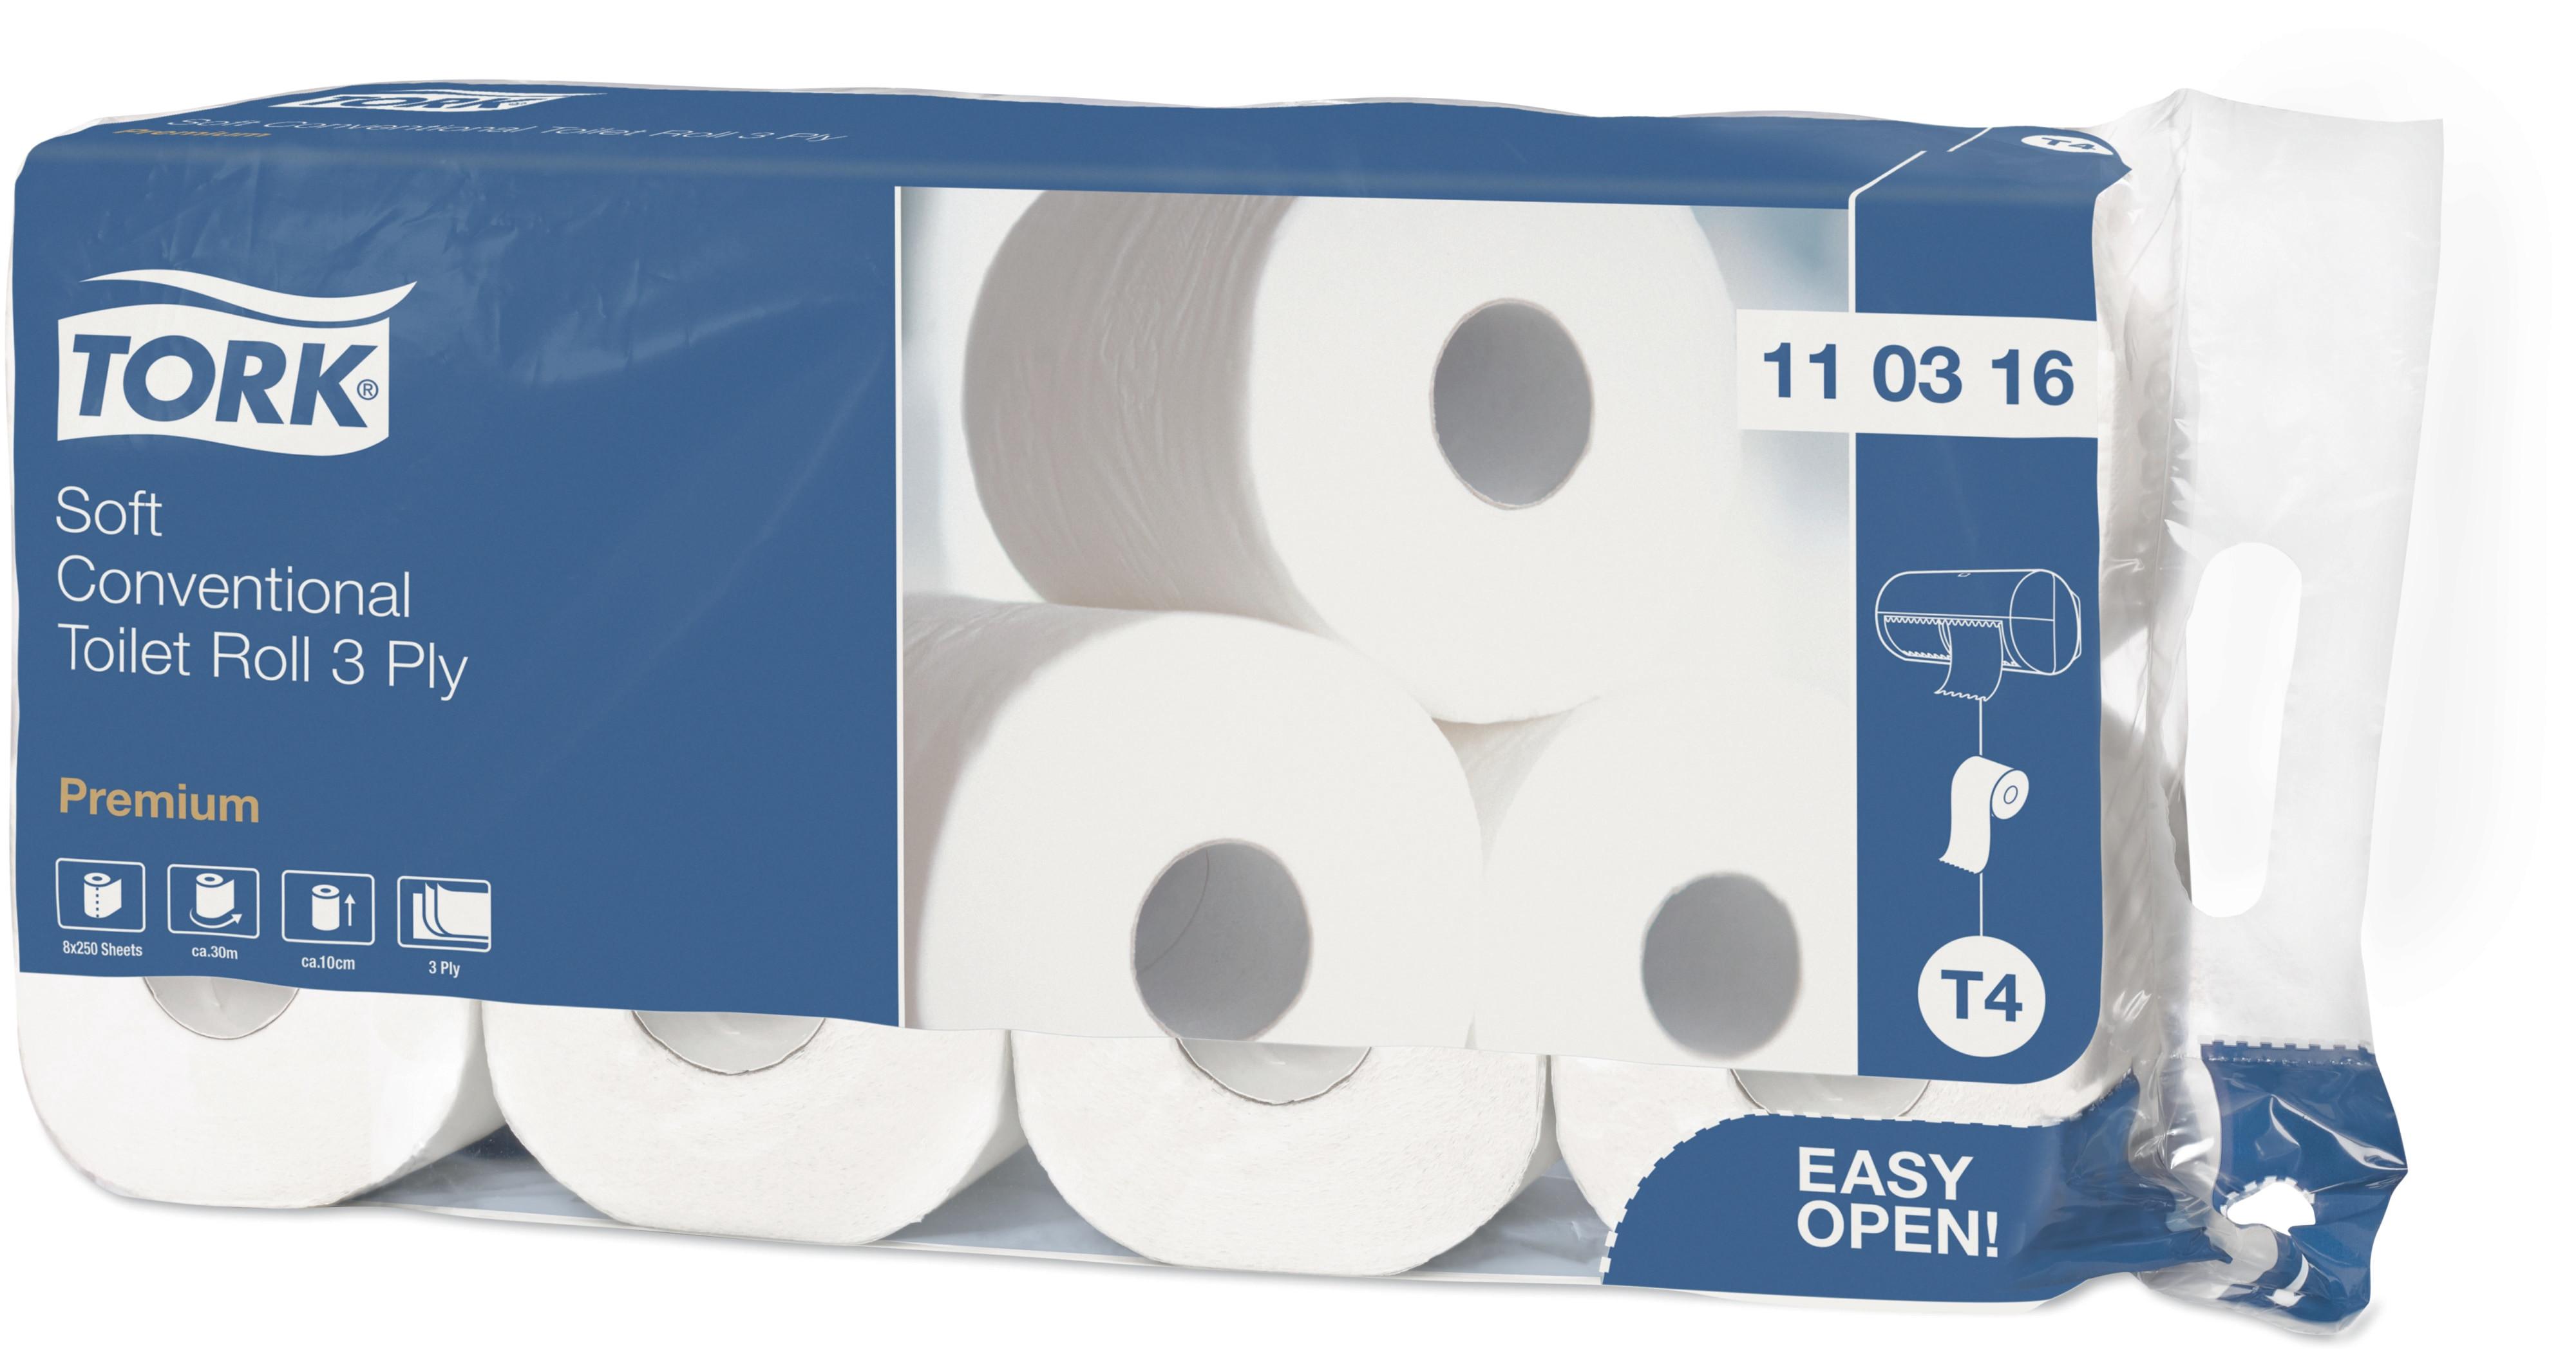 TORK Toiletpapier wit 3-laags 250vel 6 rol 110317